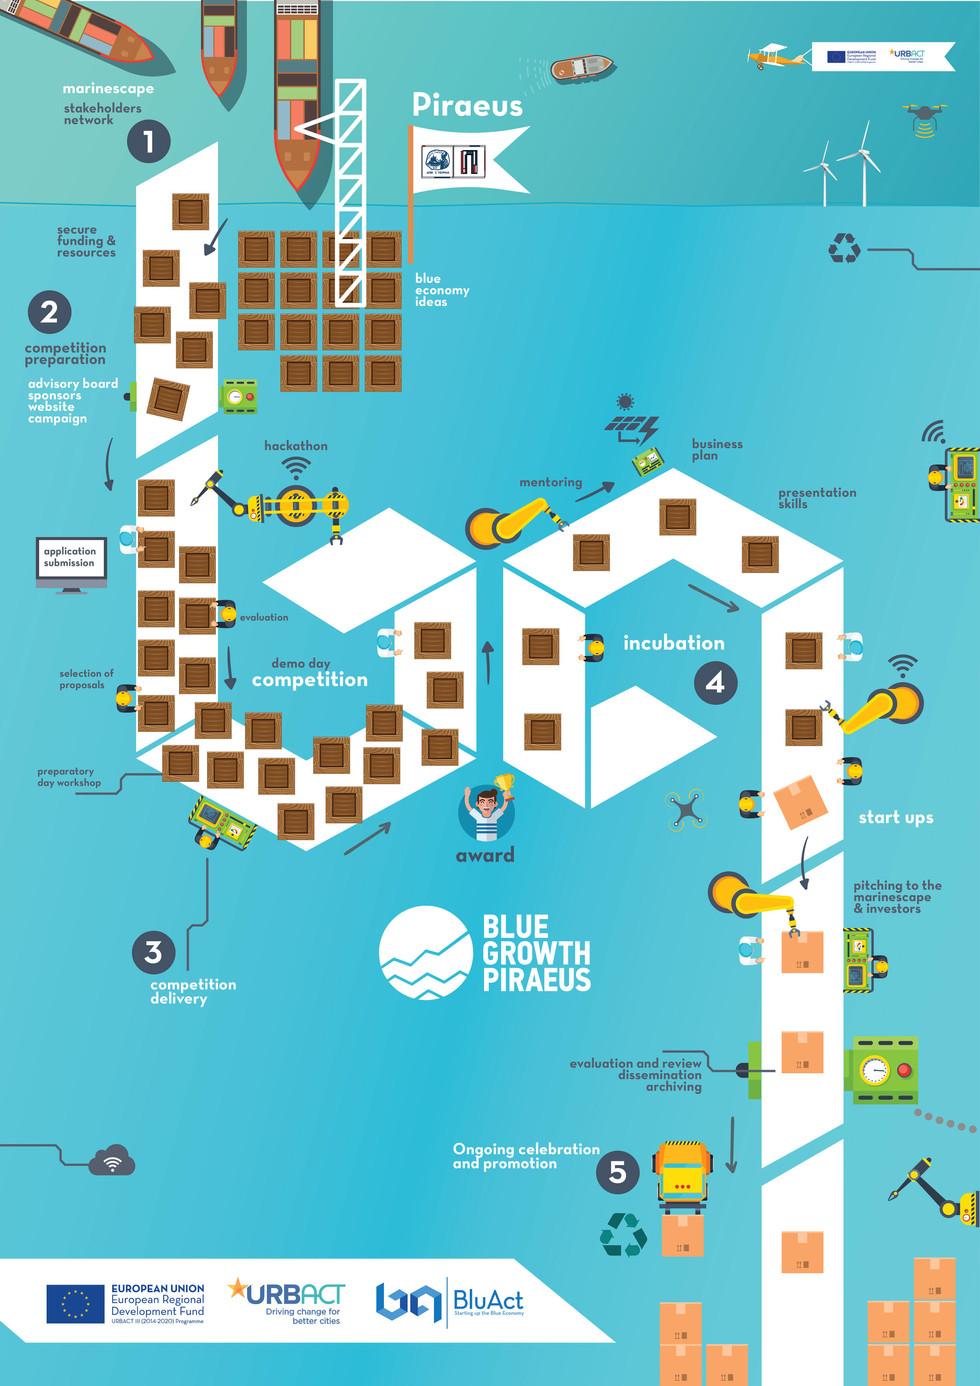 poster-1-BluAct-steps-A1-(1)-01.jpg